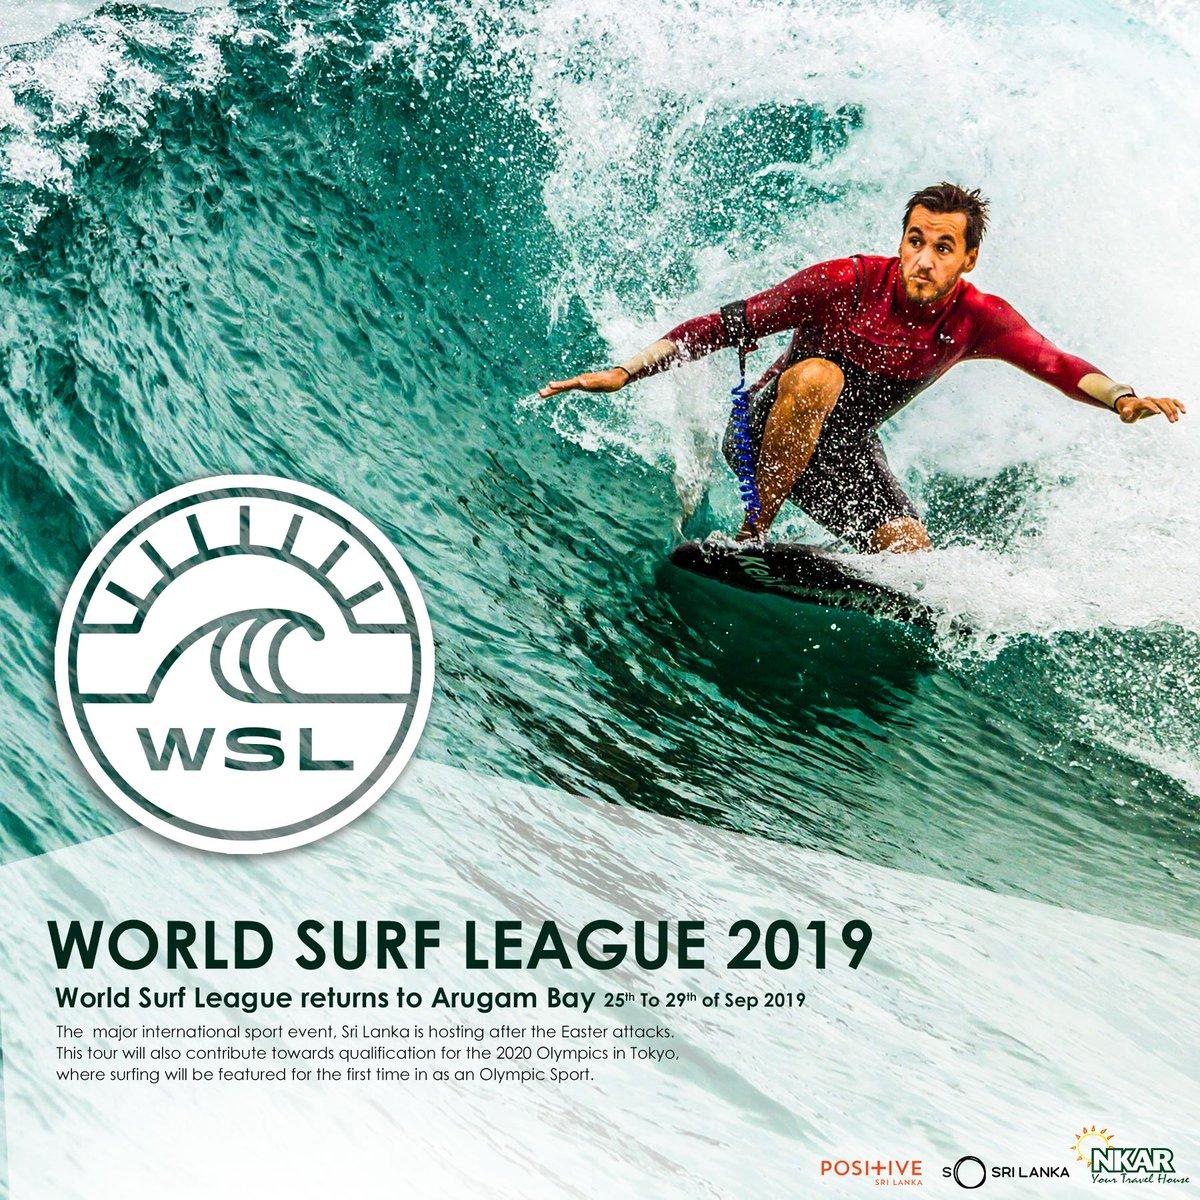 World Surf League 2019 (So Sri Lanka Pro Men's Qualifies) 🌊🏄♂️ #WSL #WorldSurfLeague #WSL2019 #Surf #ArugamBay #Surfing #Sports #SportsEvent #PositiveSriLanka #SoSriLanka #NKAR #NKARTours #SriLanka #SriLankaTourism #VisitSriLanka #SriLankaEvents